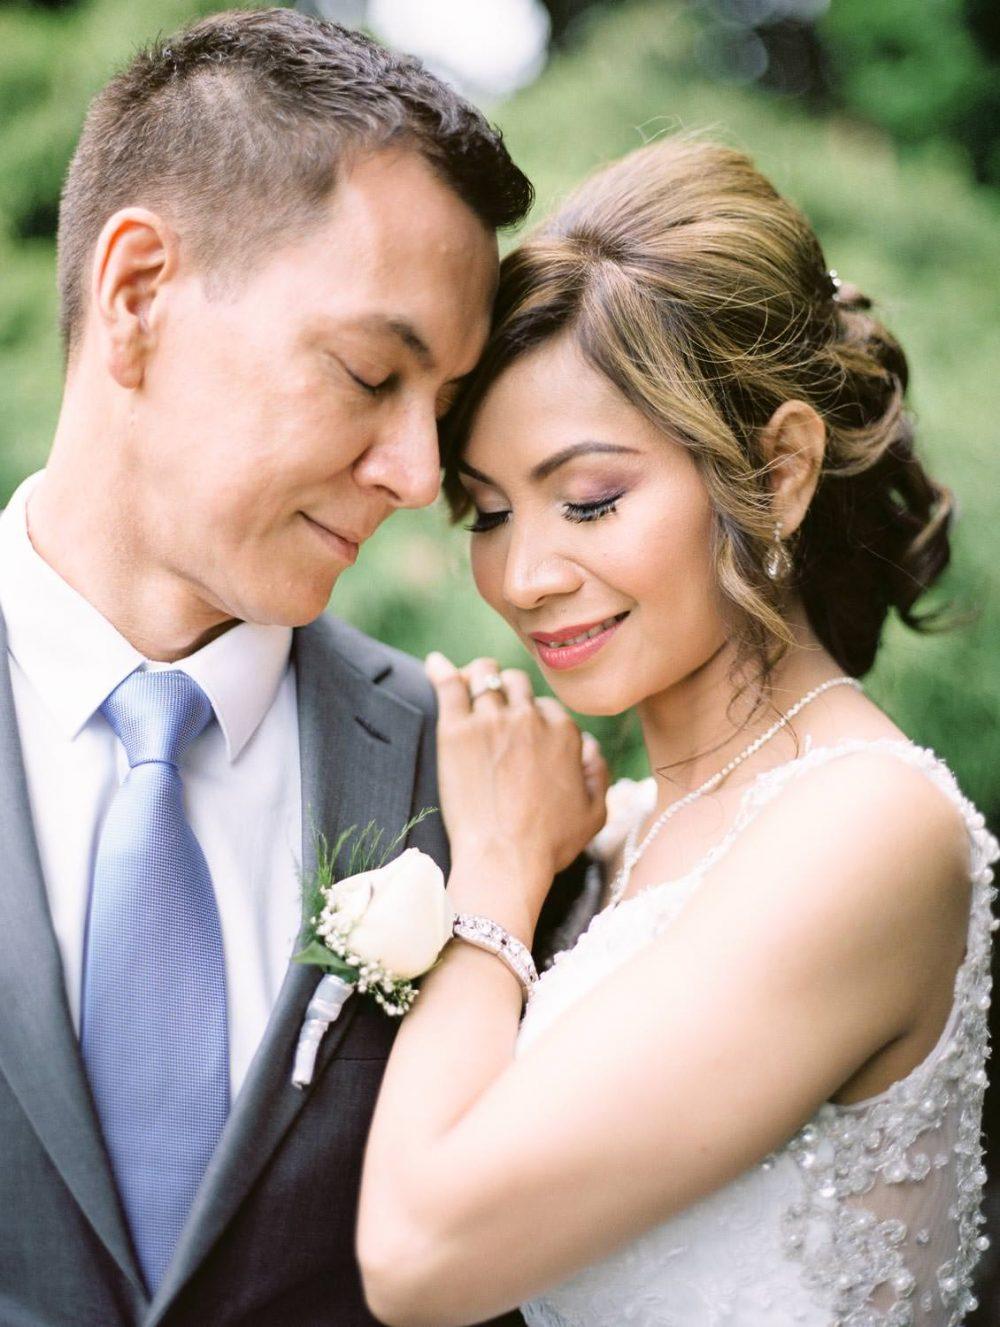 Bride and groom posing | Vancouver film wedding photographer